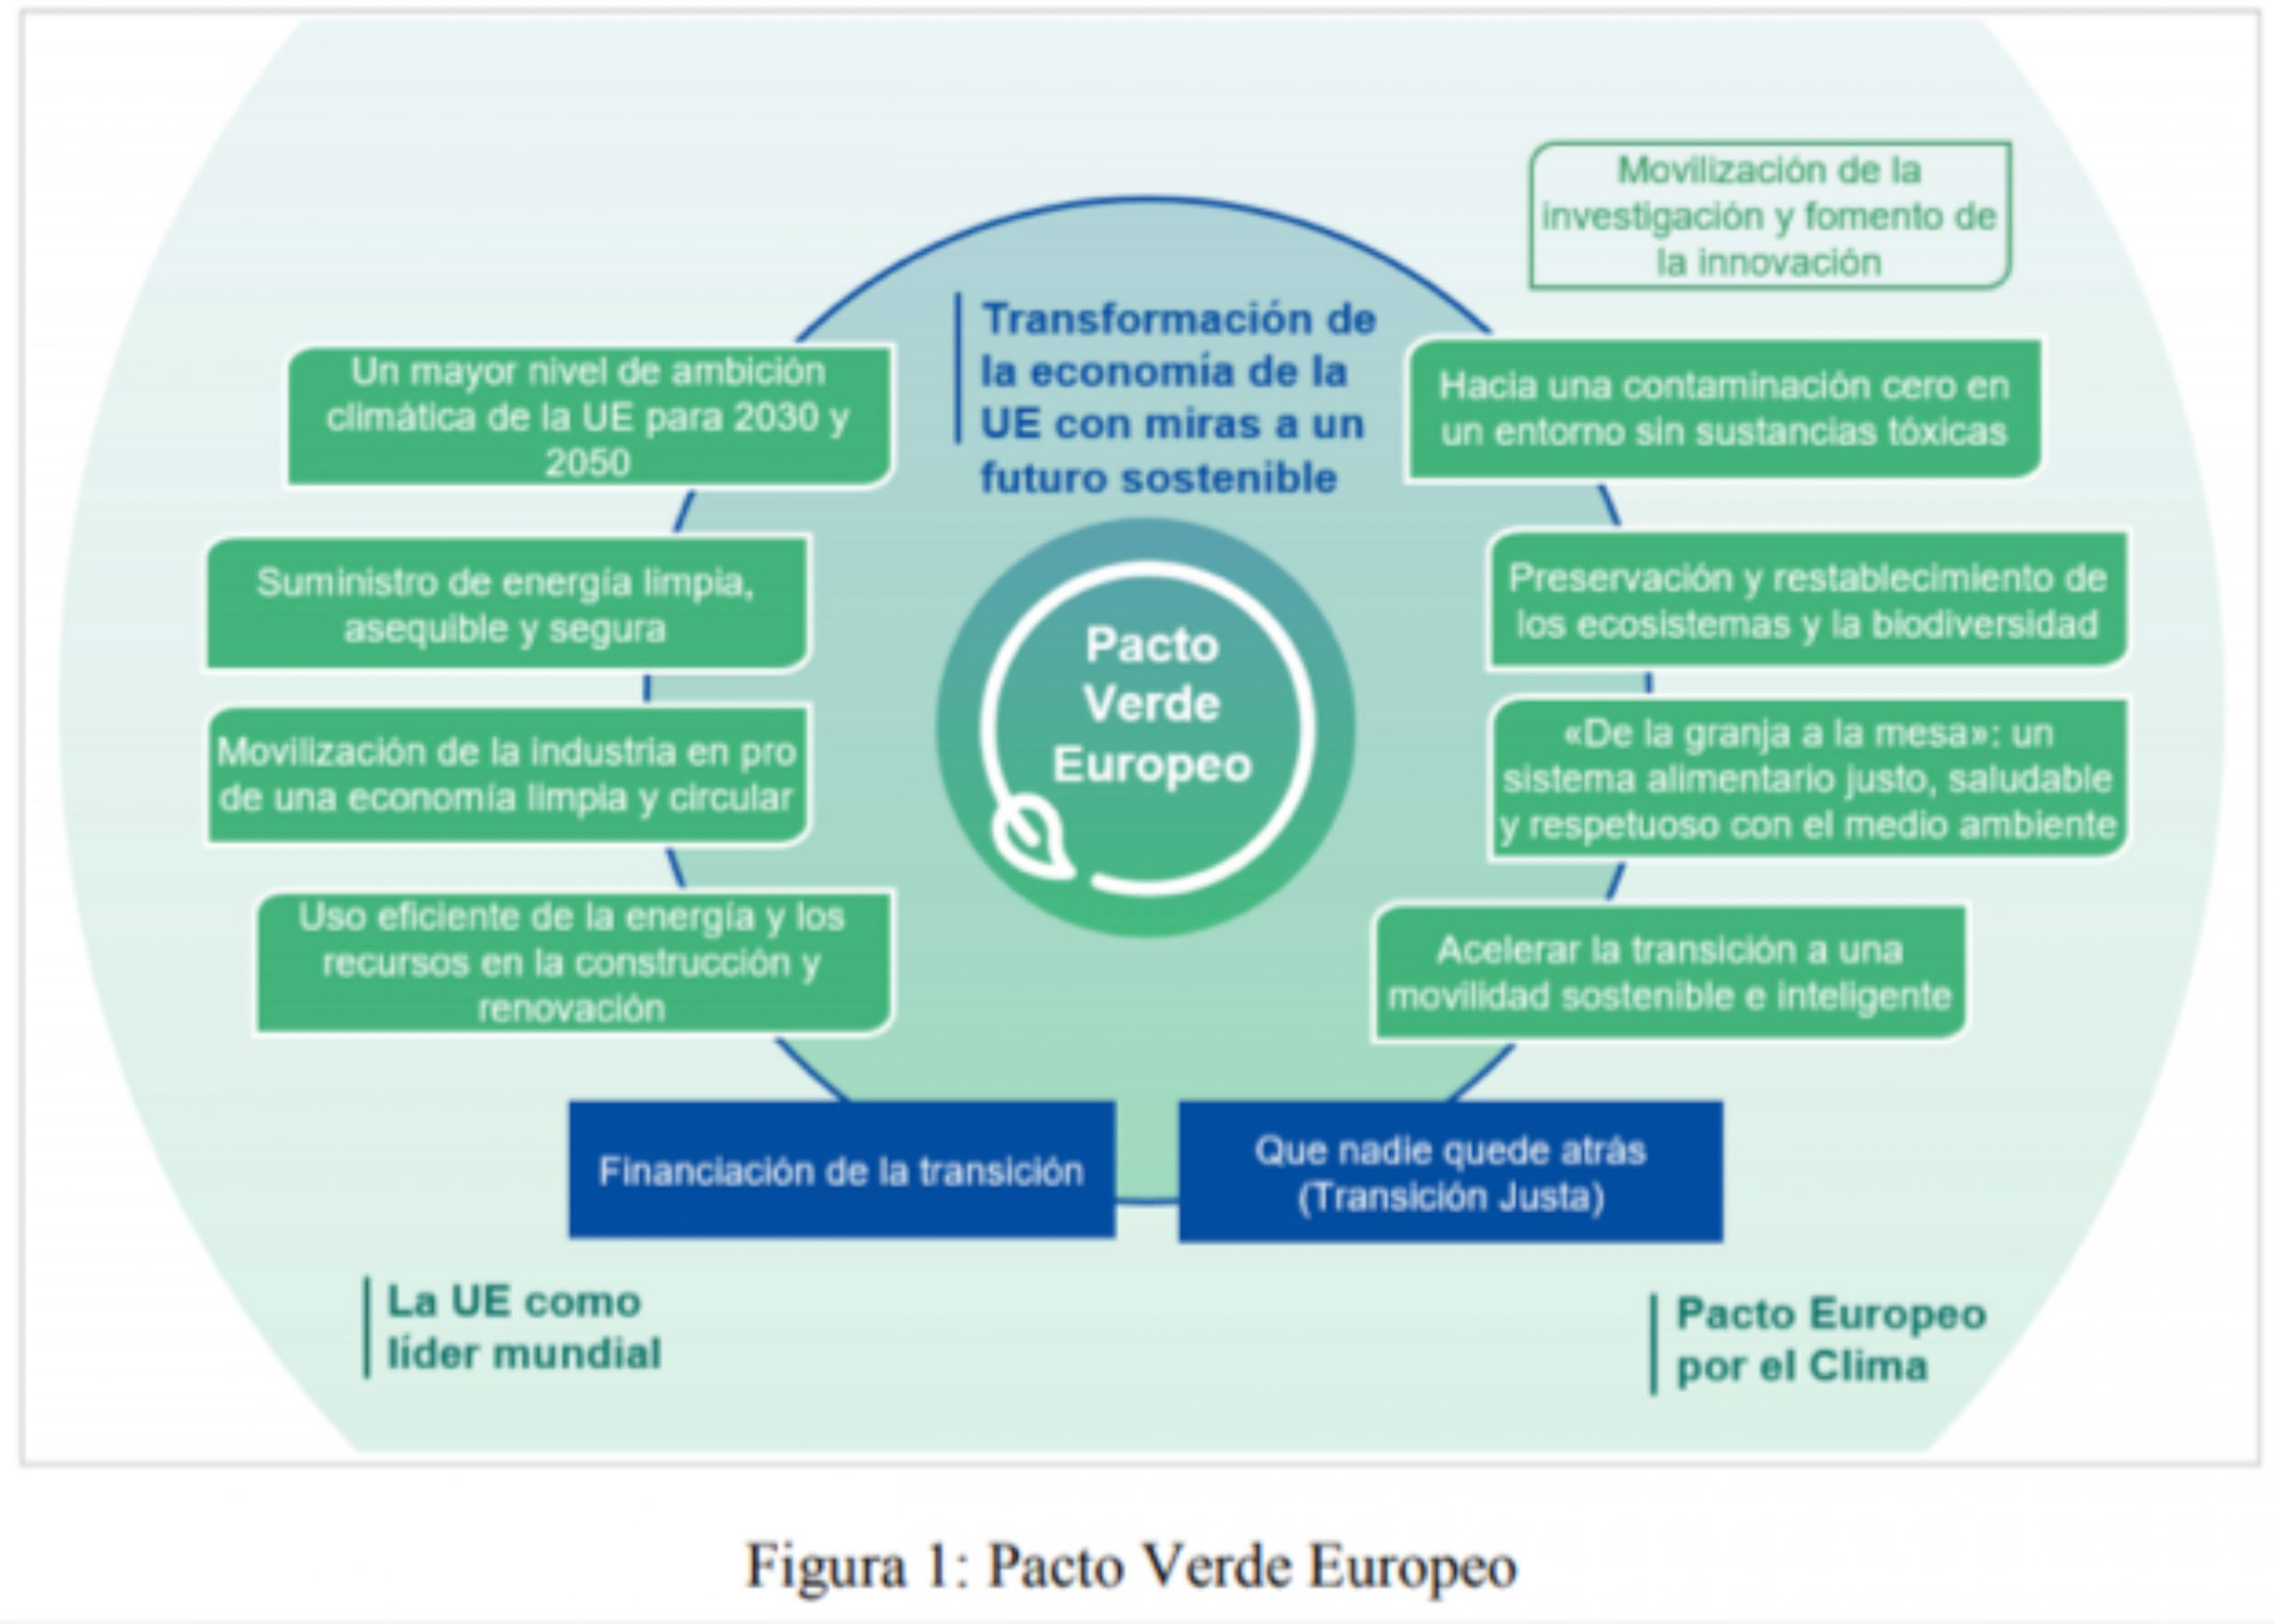 Estado de la reforma de la PAC post 2020